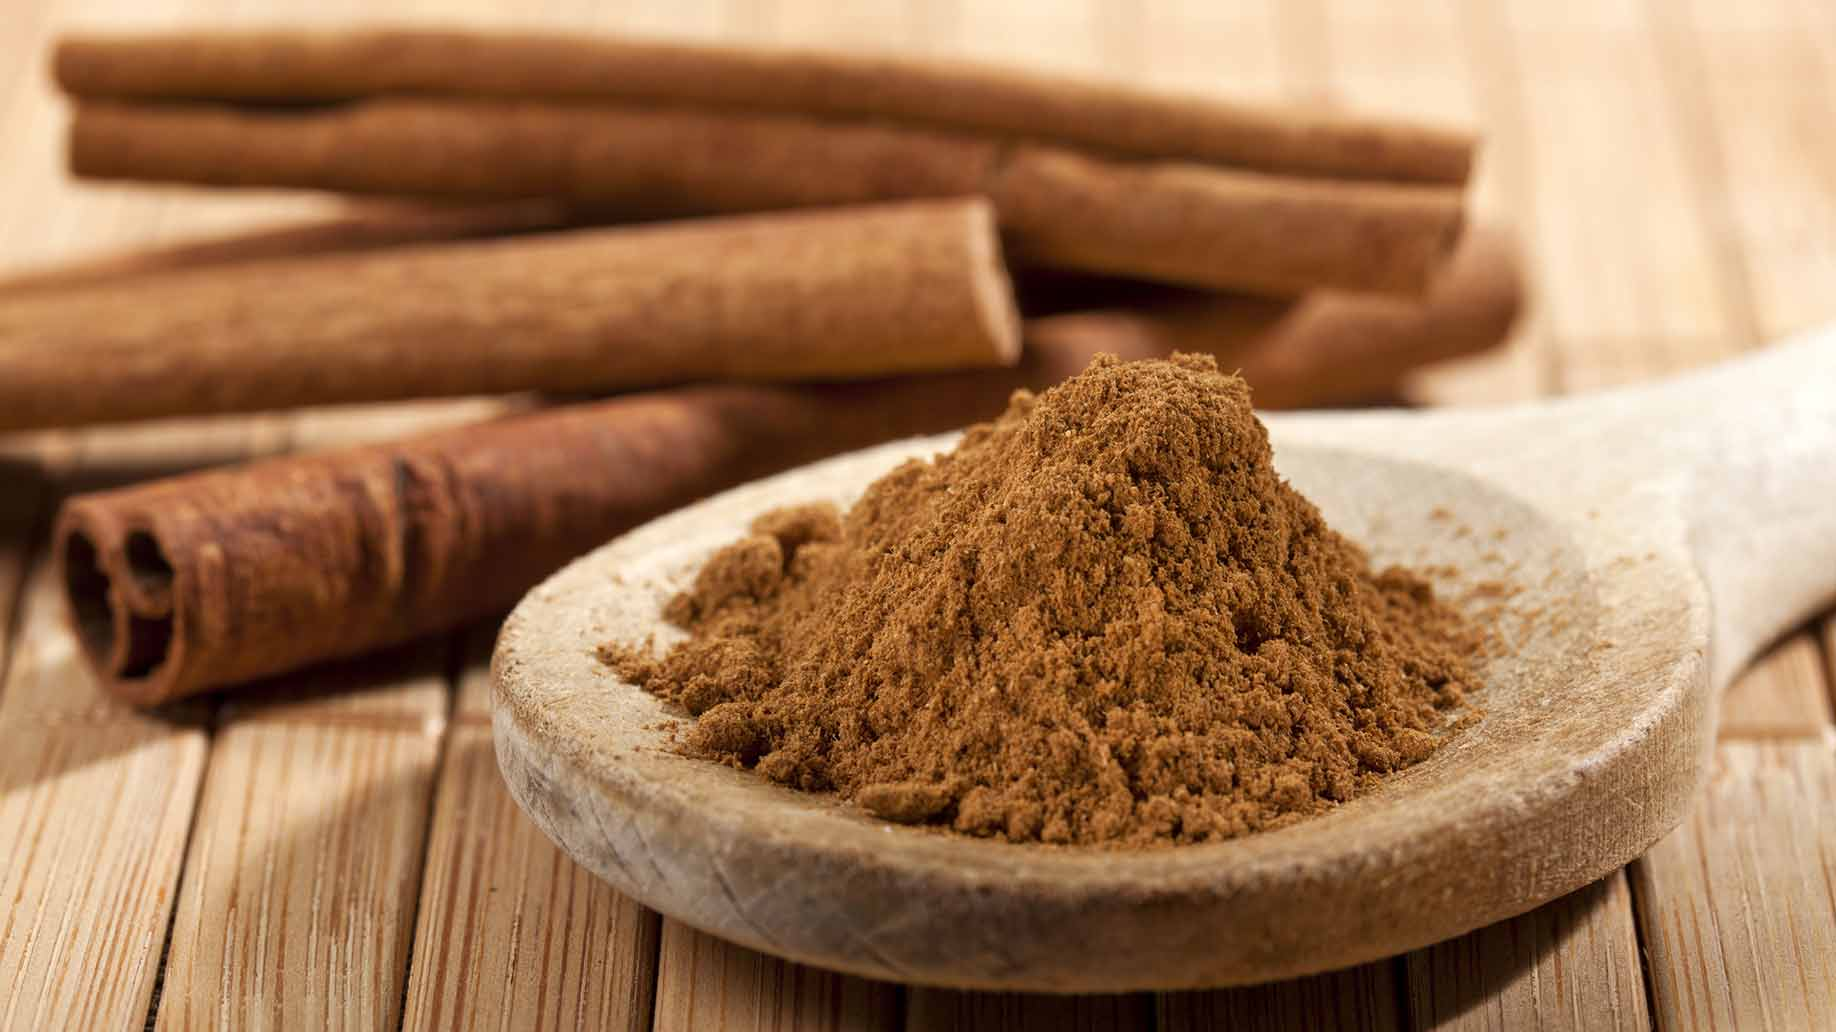 cinnamon ceylon ground powder sticks for bad breath halitosis how to get rid of naturally